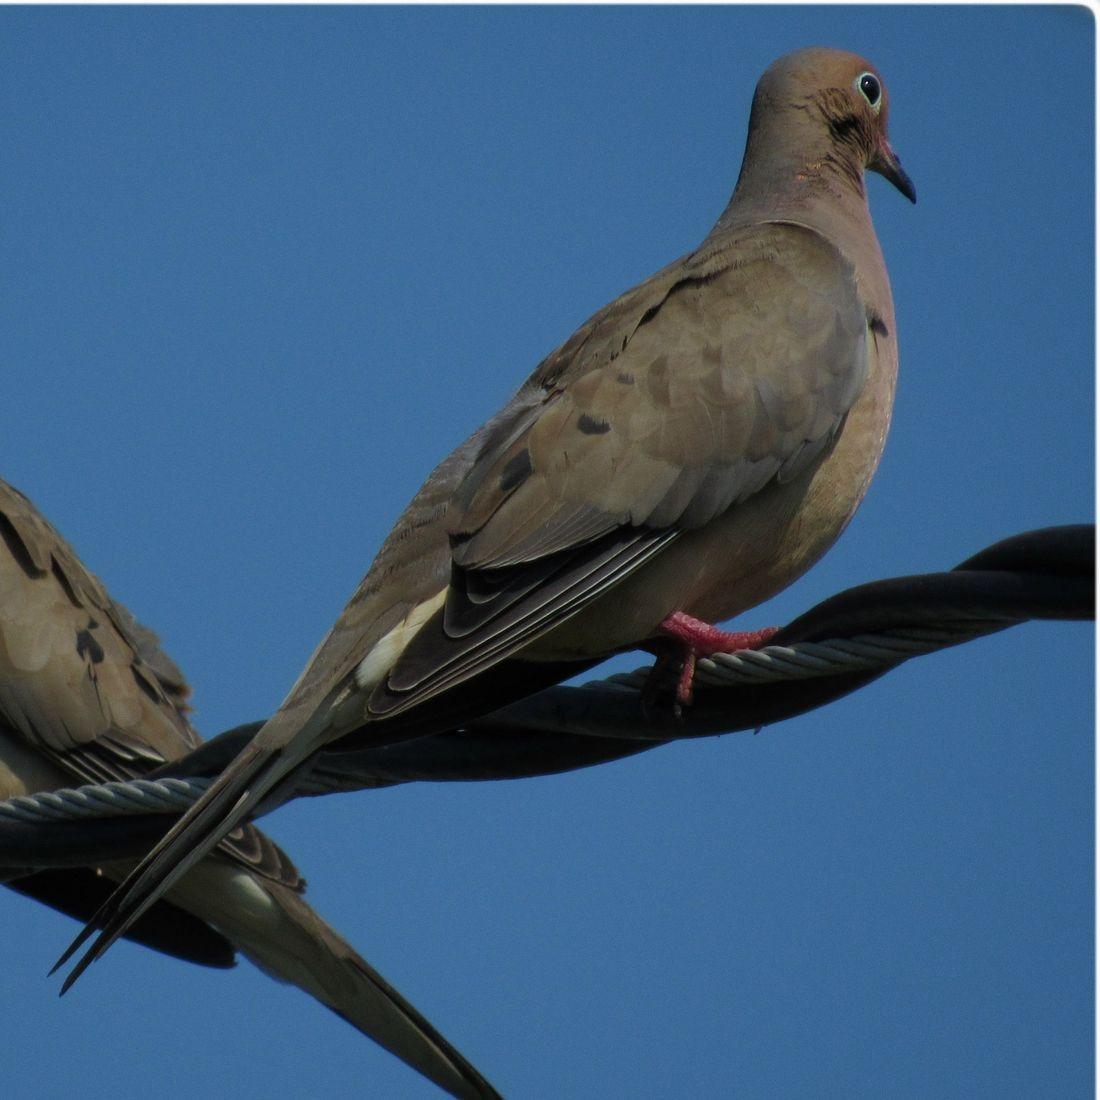 Pigeon, Bird, Sky